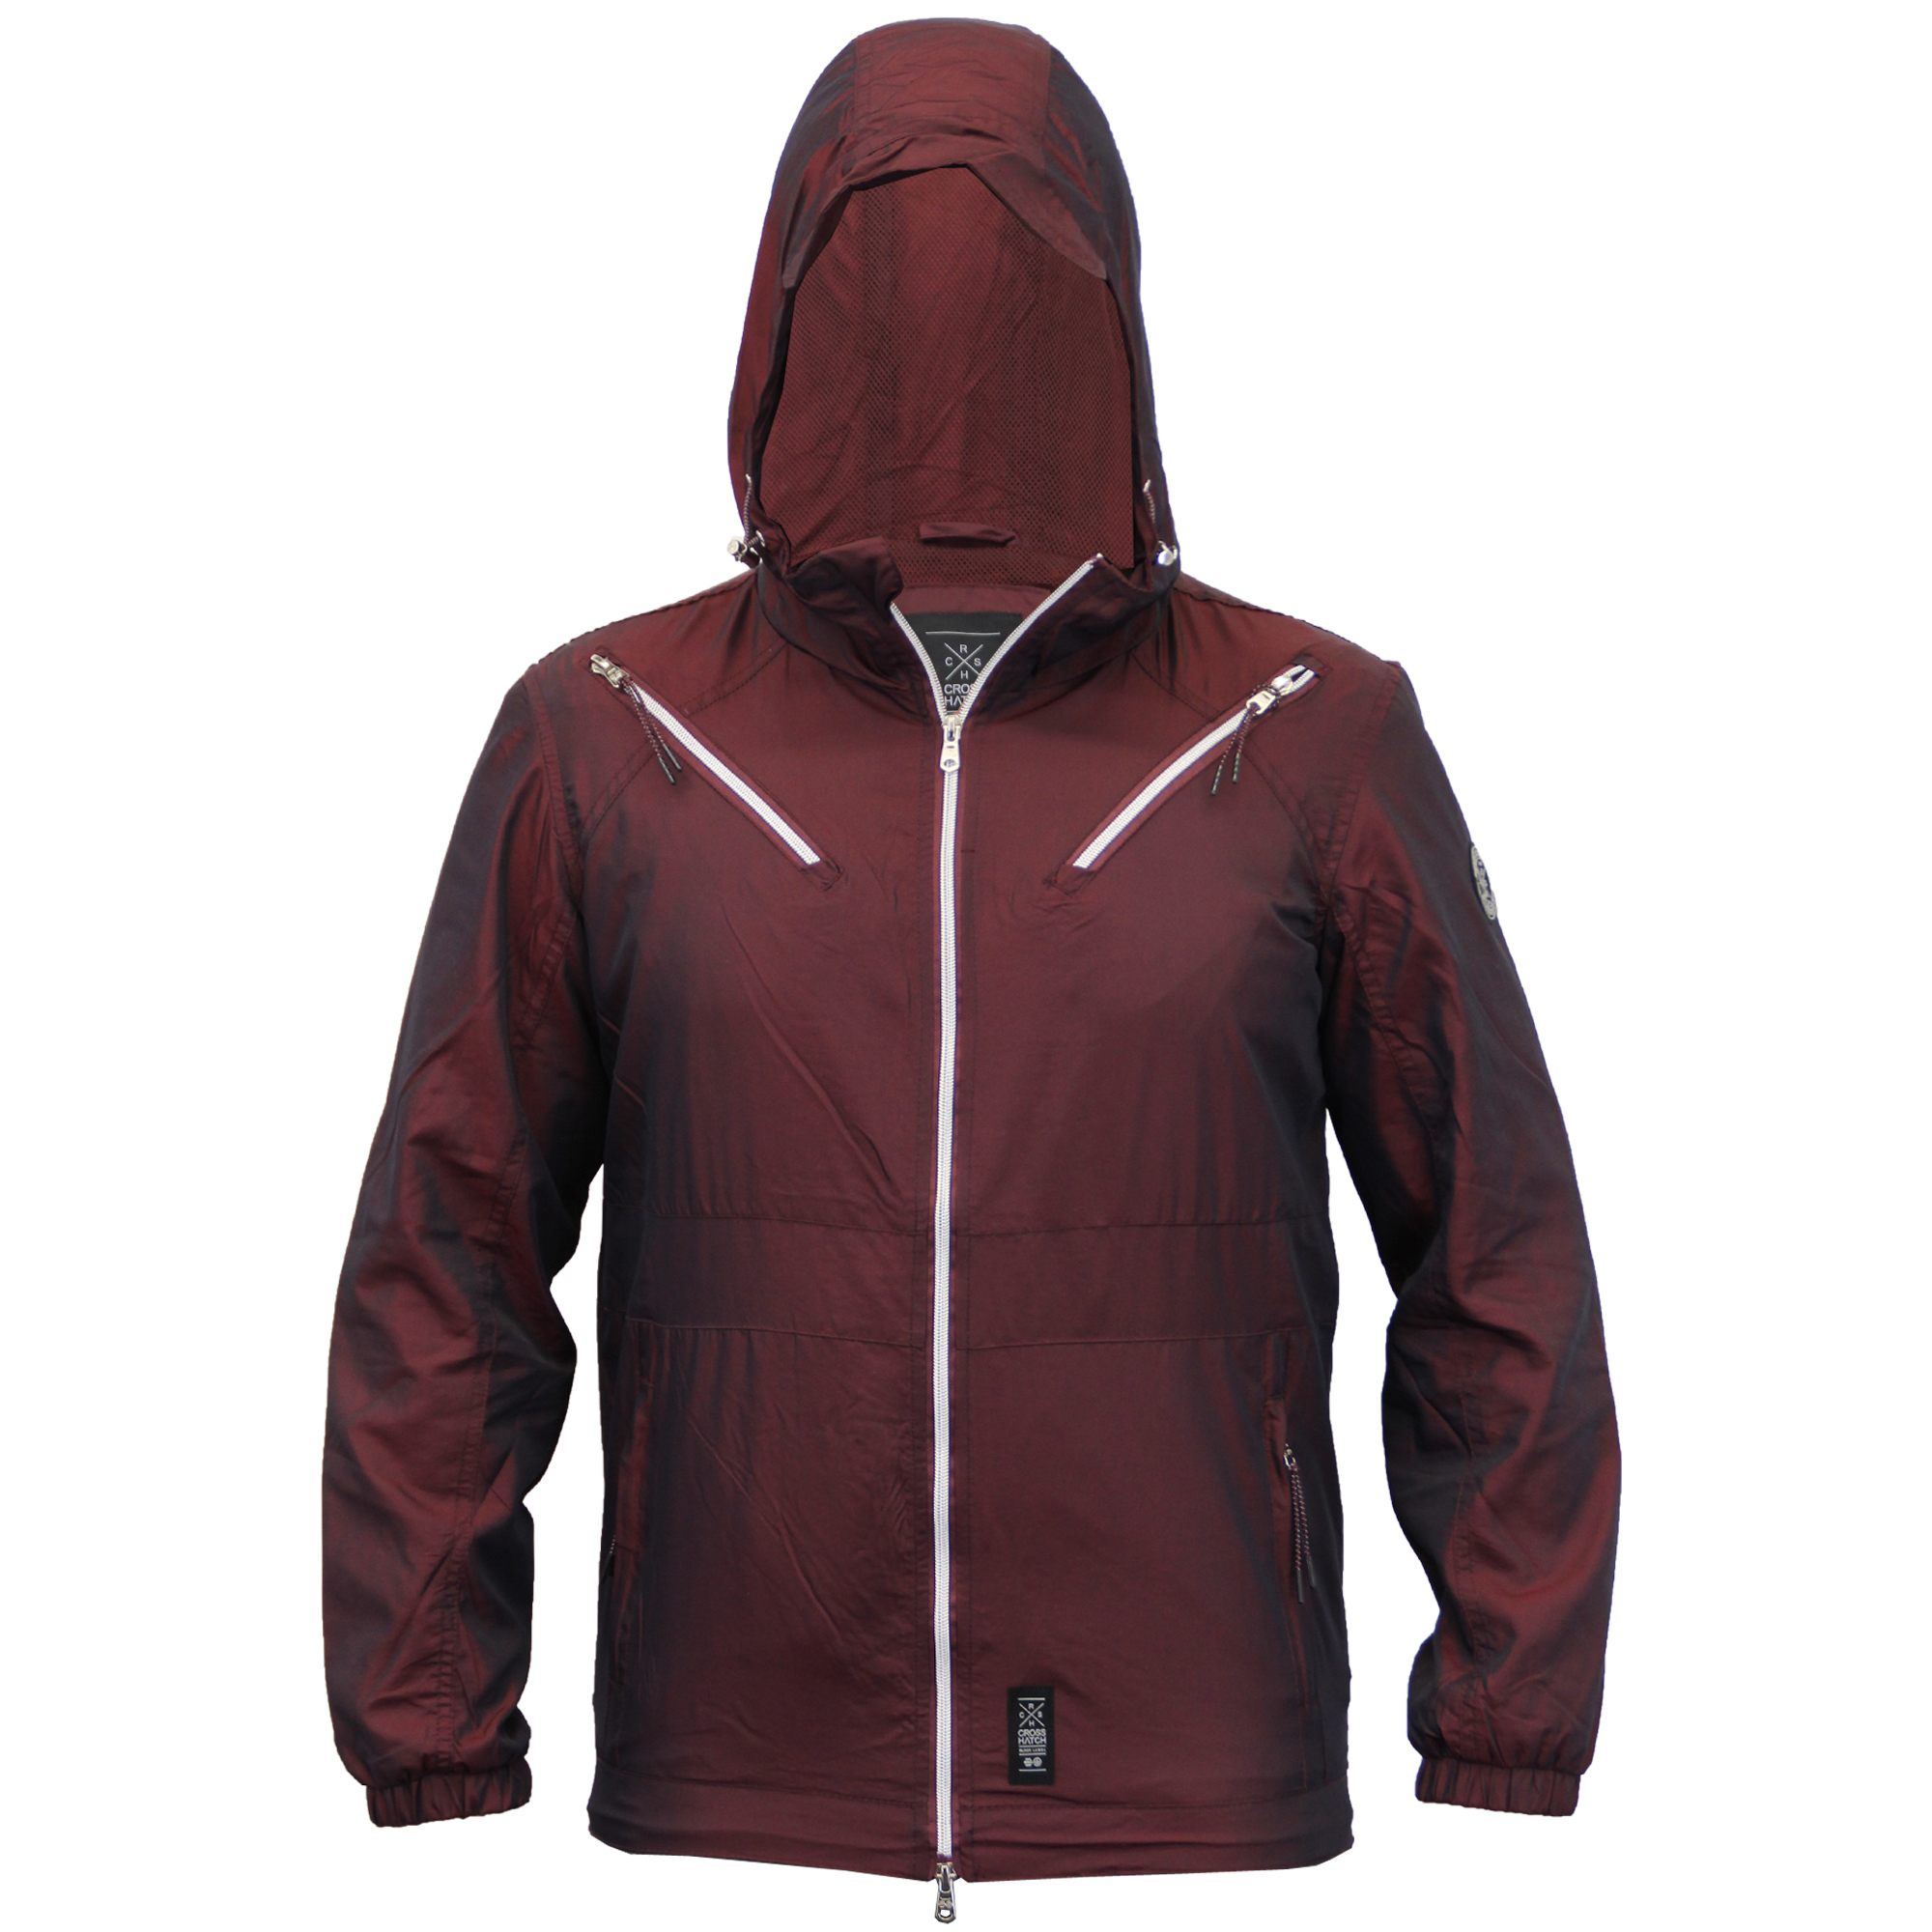 Mens-Windbreaker-Jacket-Crosshatch-Coat-Hooded-Mesh-Lined-Zip-Casual-Summer-New thumbnail 11